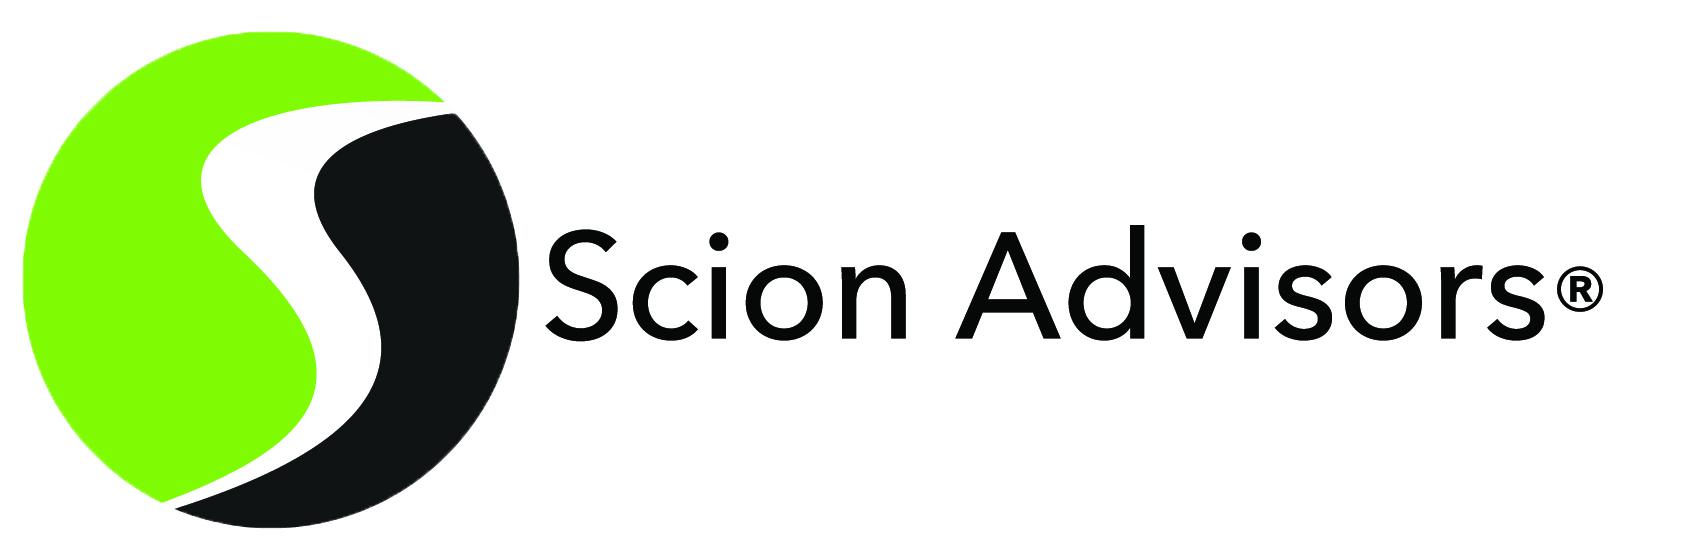 Scion Advisors